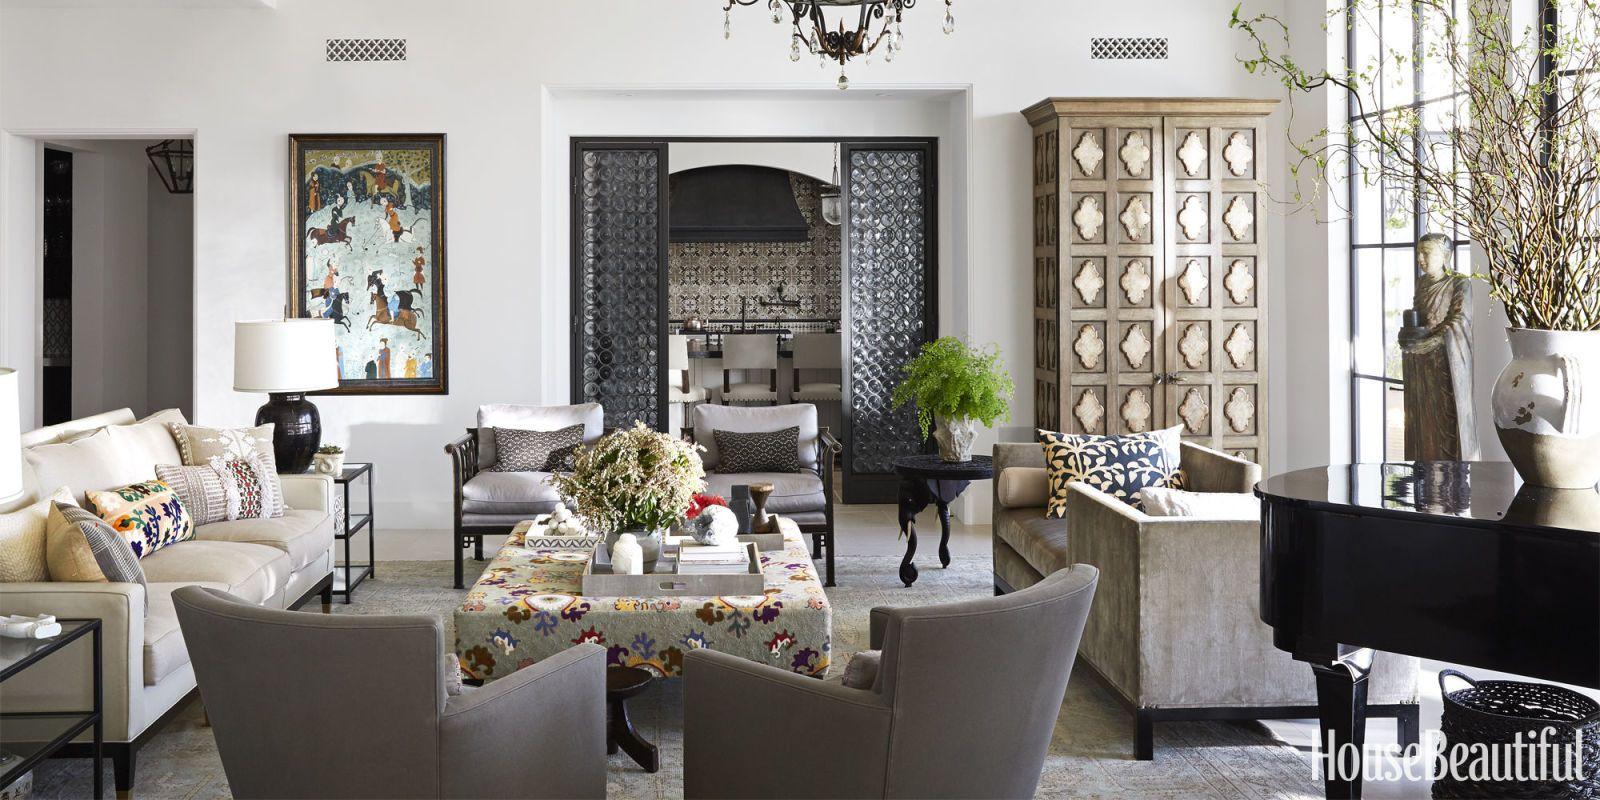 Moroccan decor in modern home